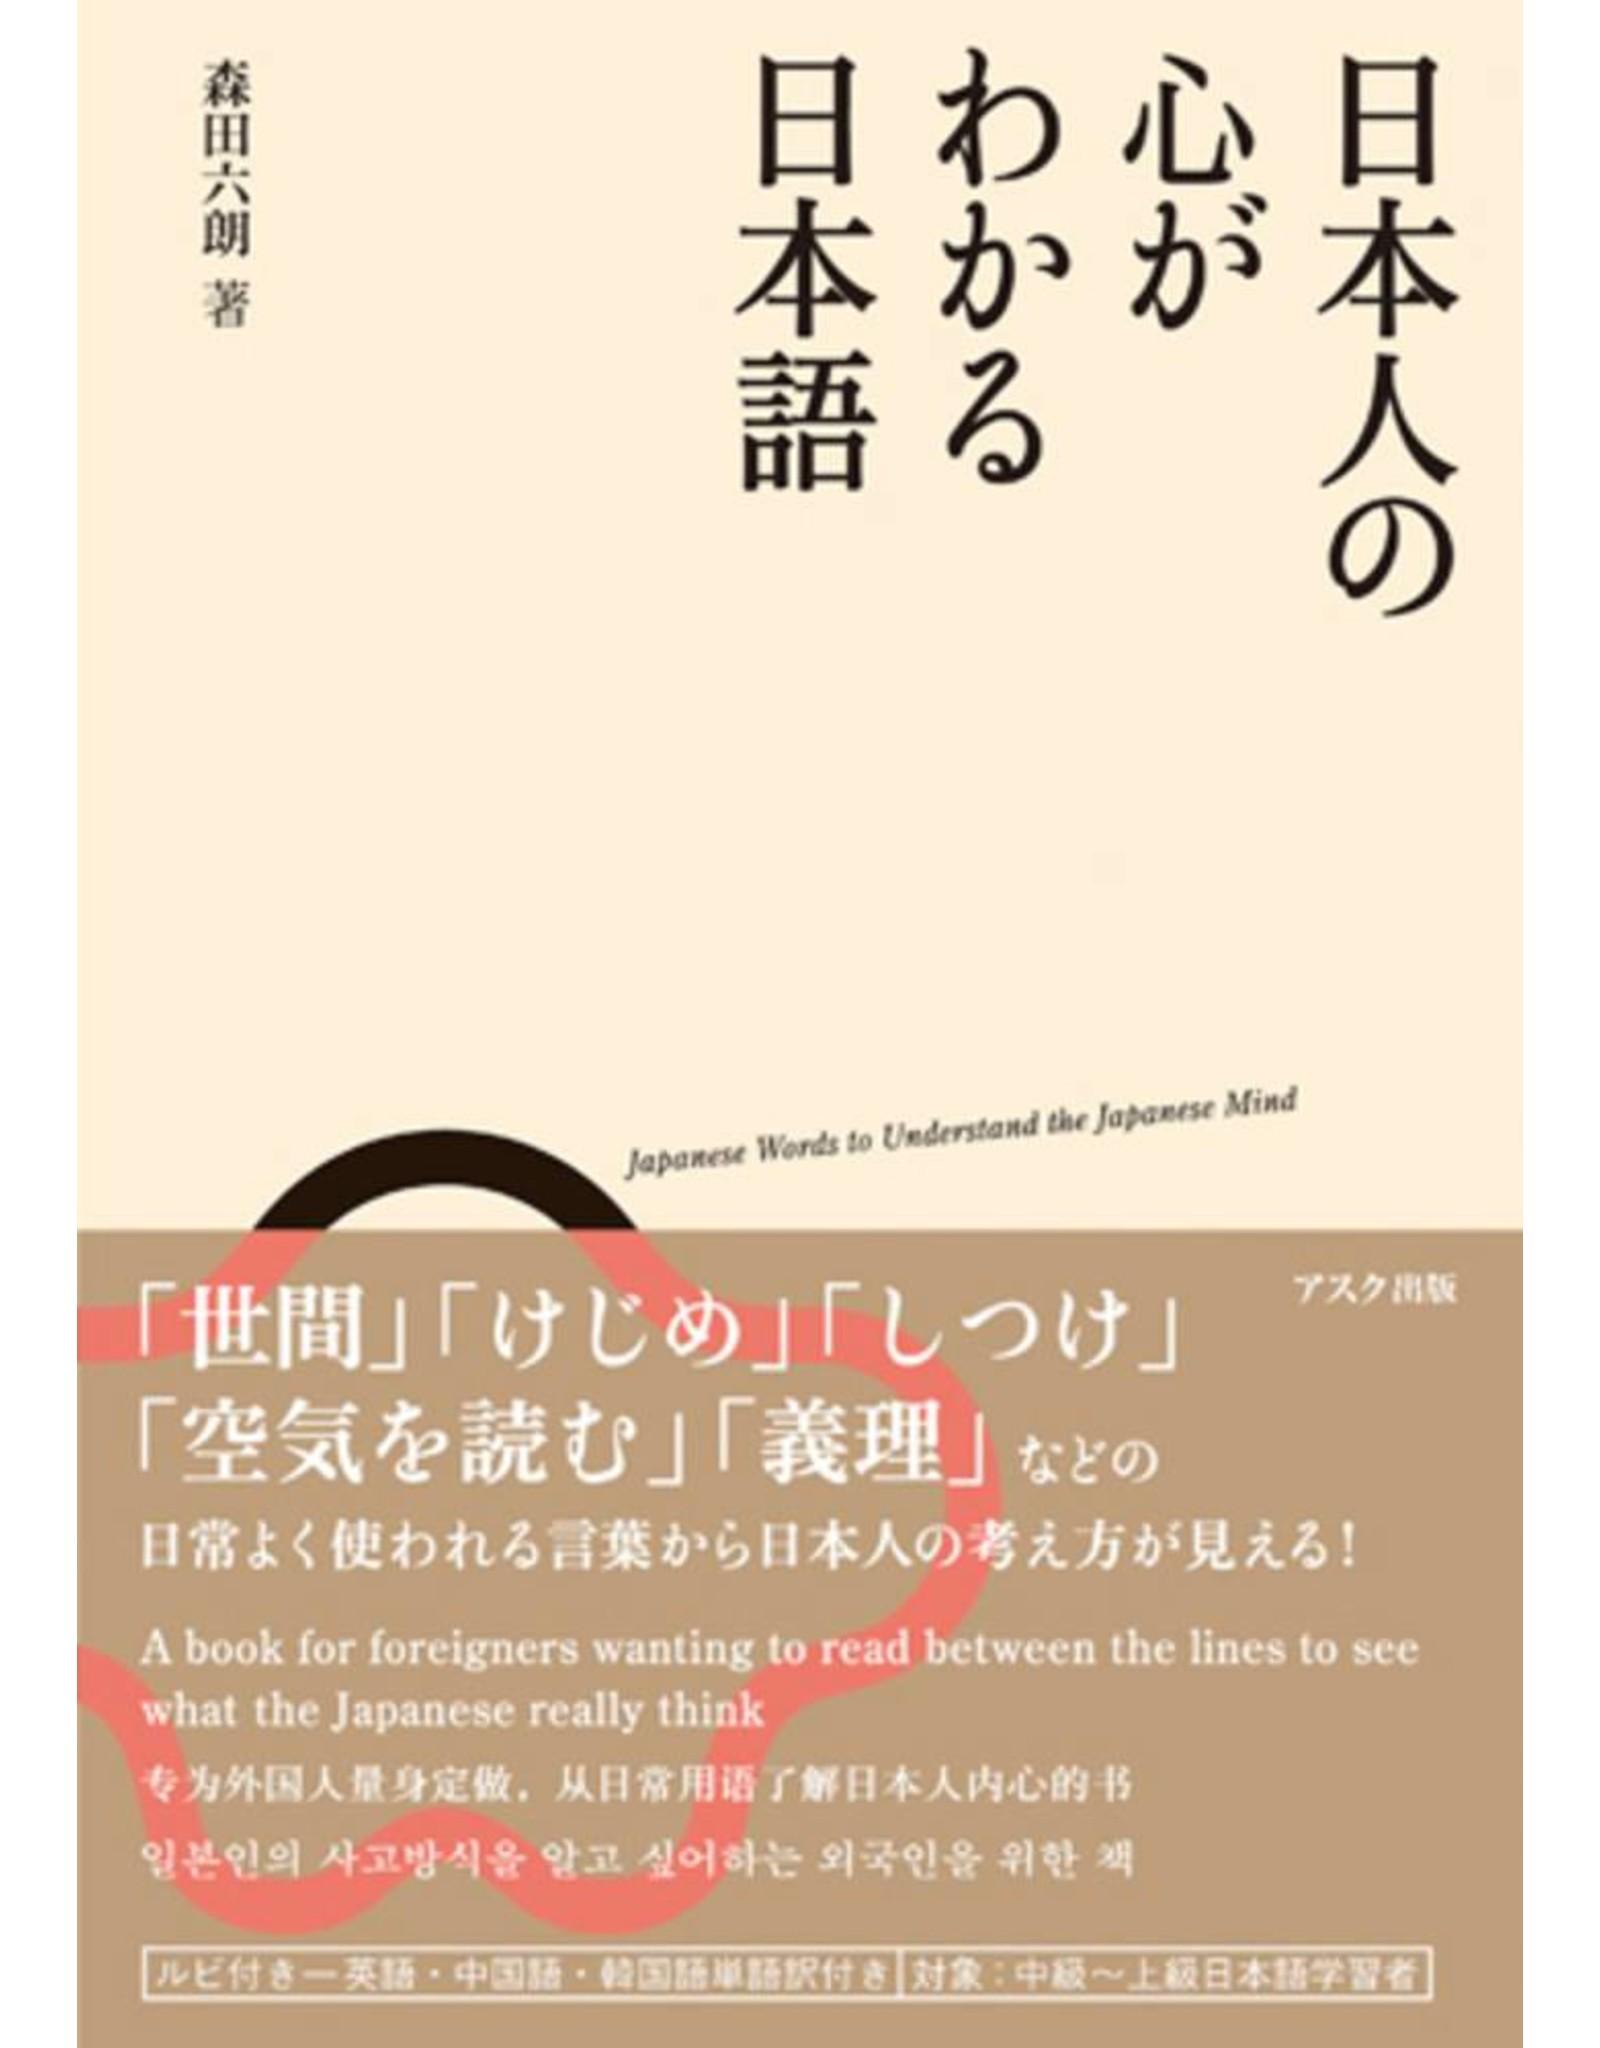 ASK NIHONJIN NO KOKORO GA WAKARU NIHONGO : JAPANESE WORDS TO UNDERSTAND THE JAPANESE MIND